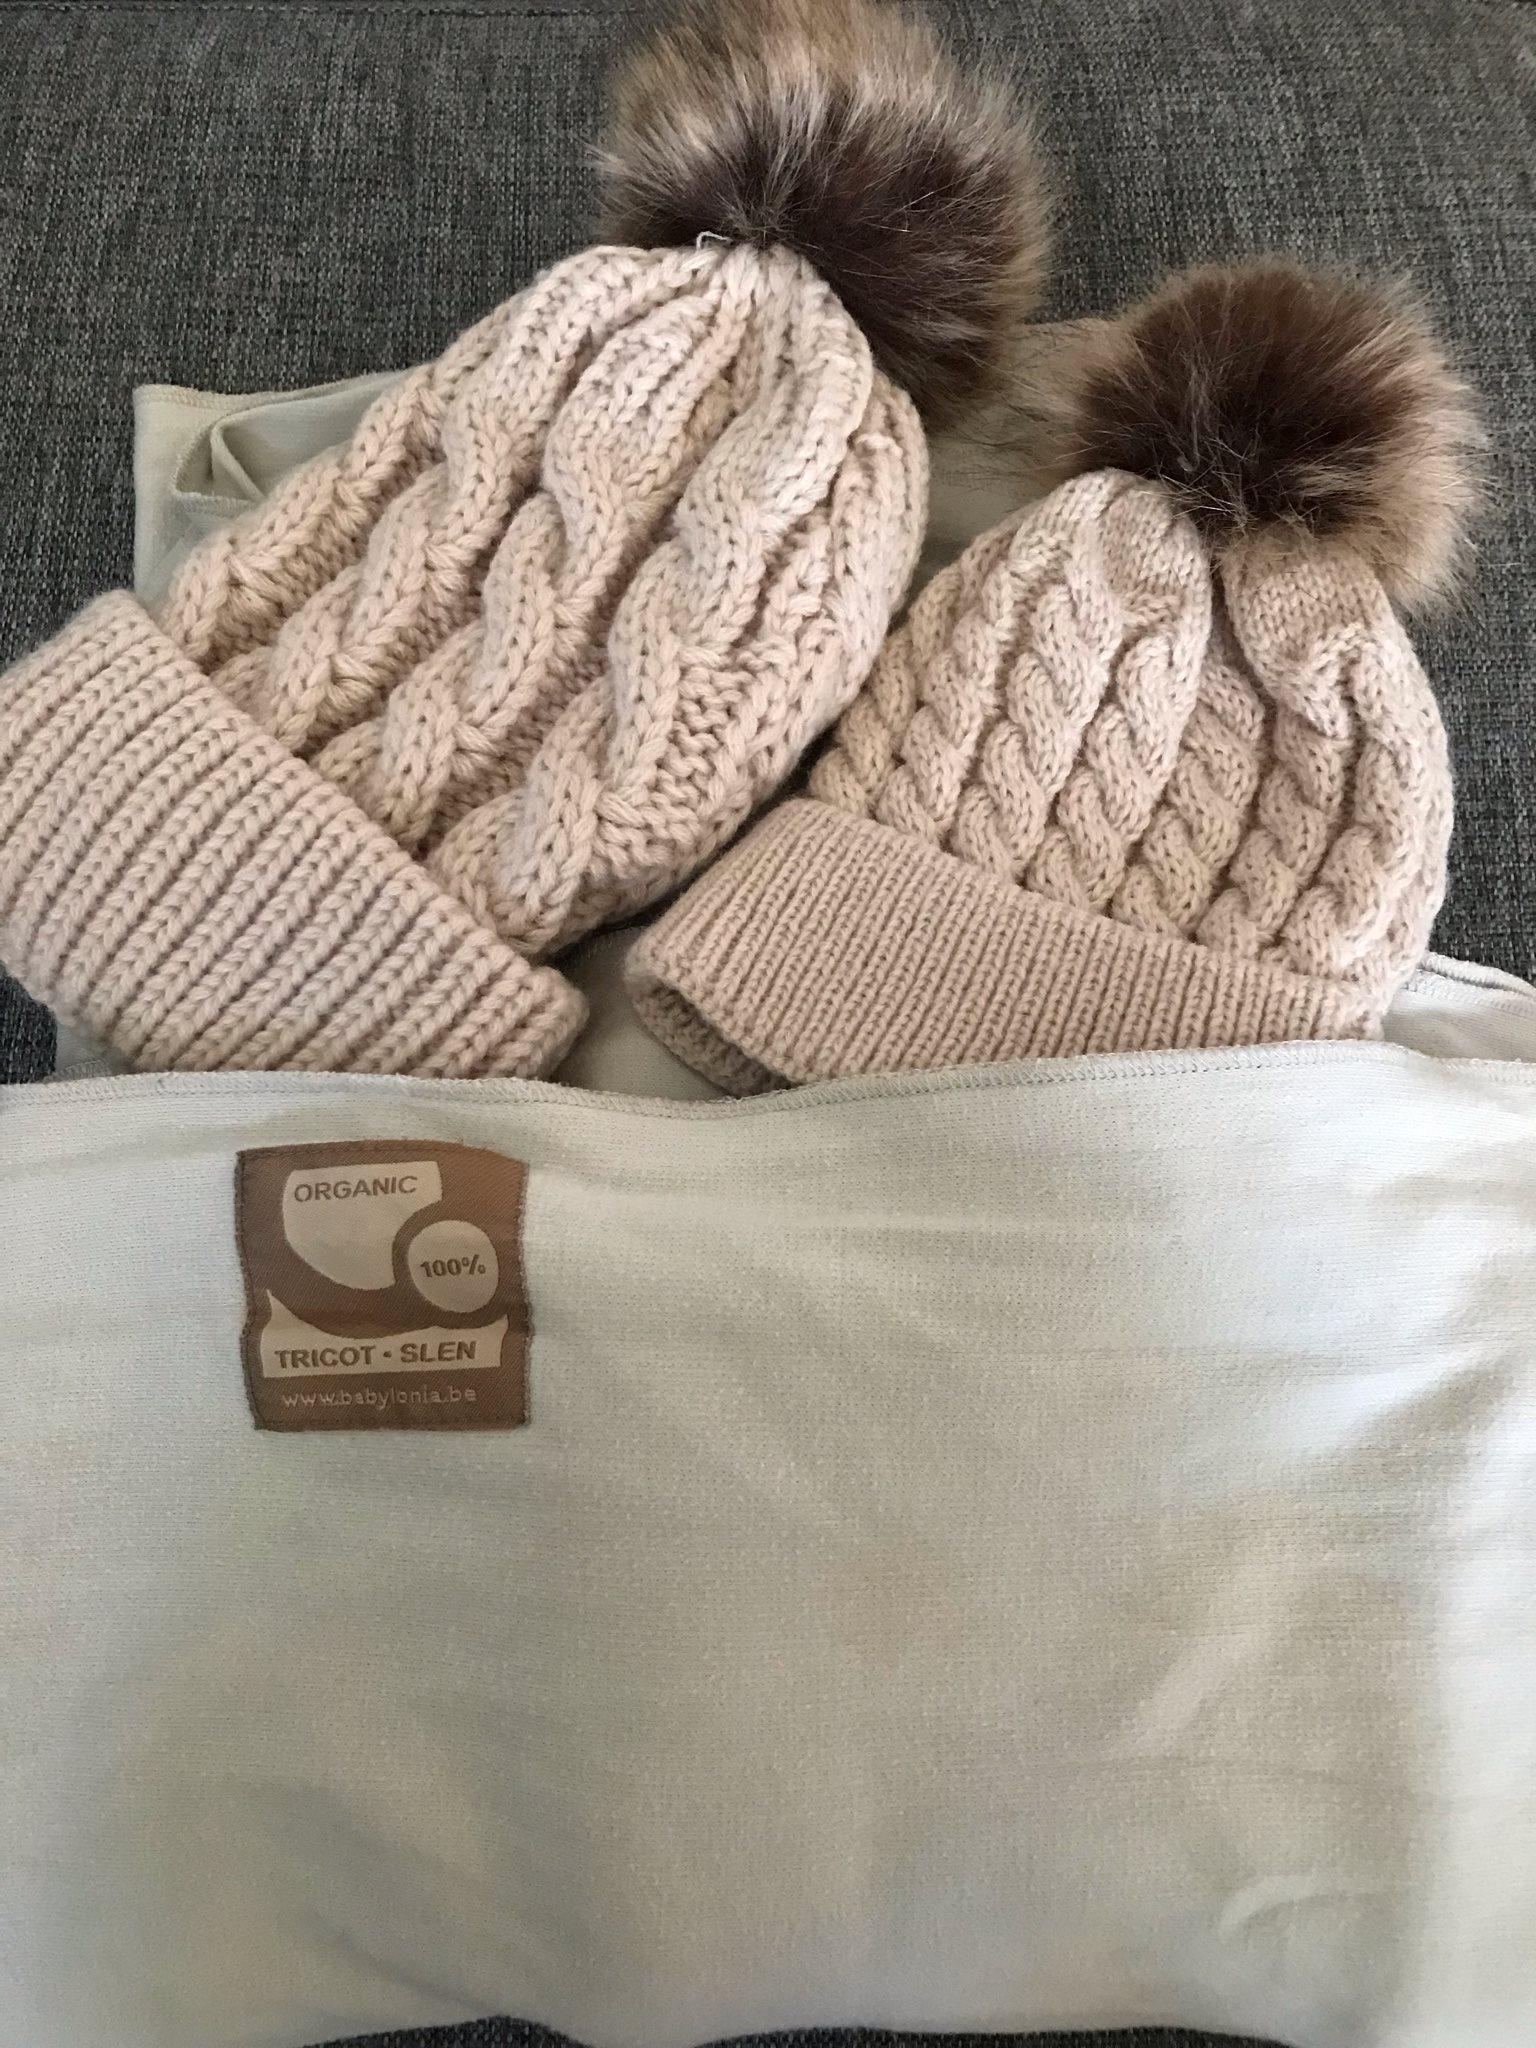 Tricot-Slen sjal & matchande mössor!